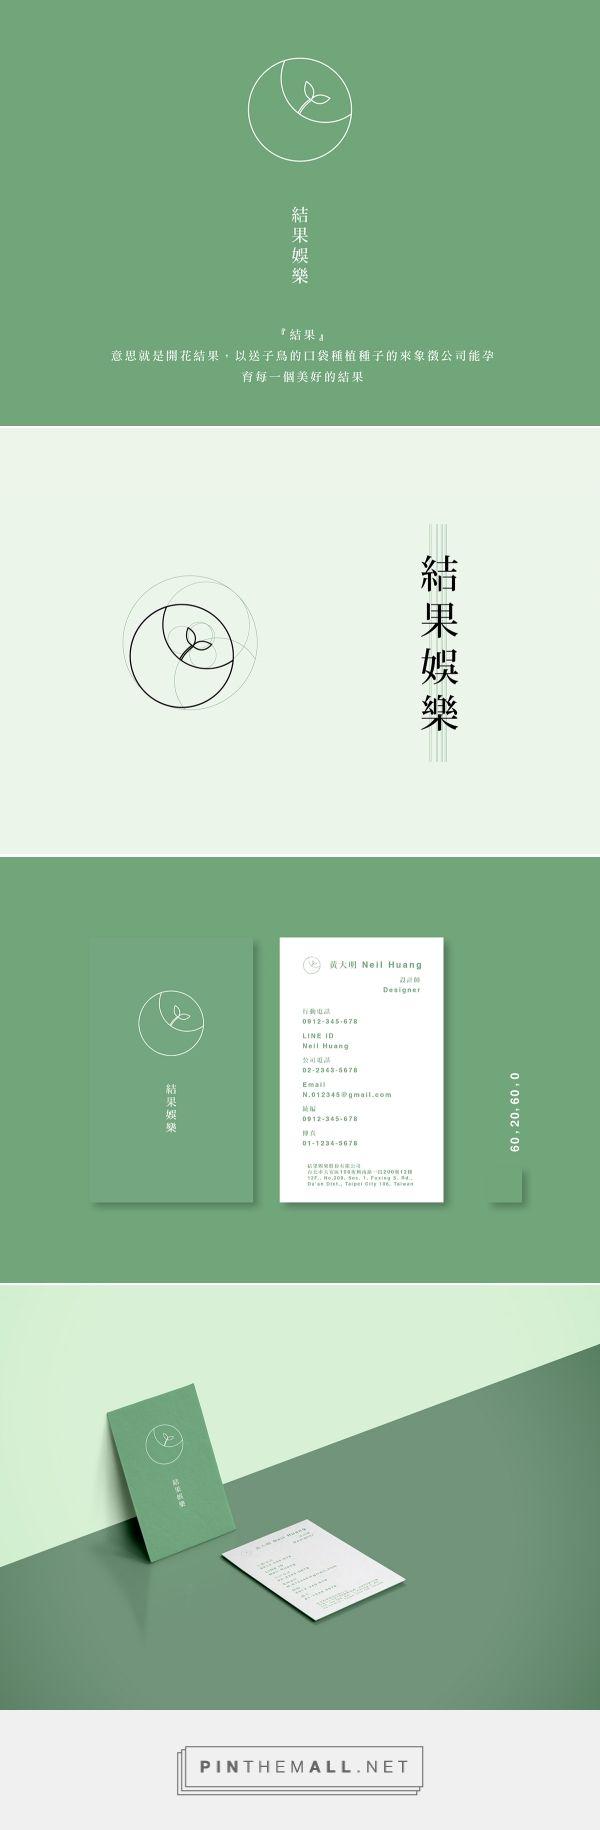 ChiehKuoYuLe  Logo & Business Card | 結果娛樂形象與名片設計 on Behance - created via https://pinthemall.net